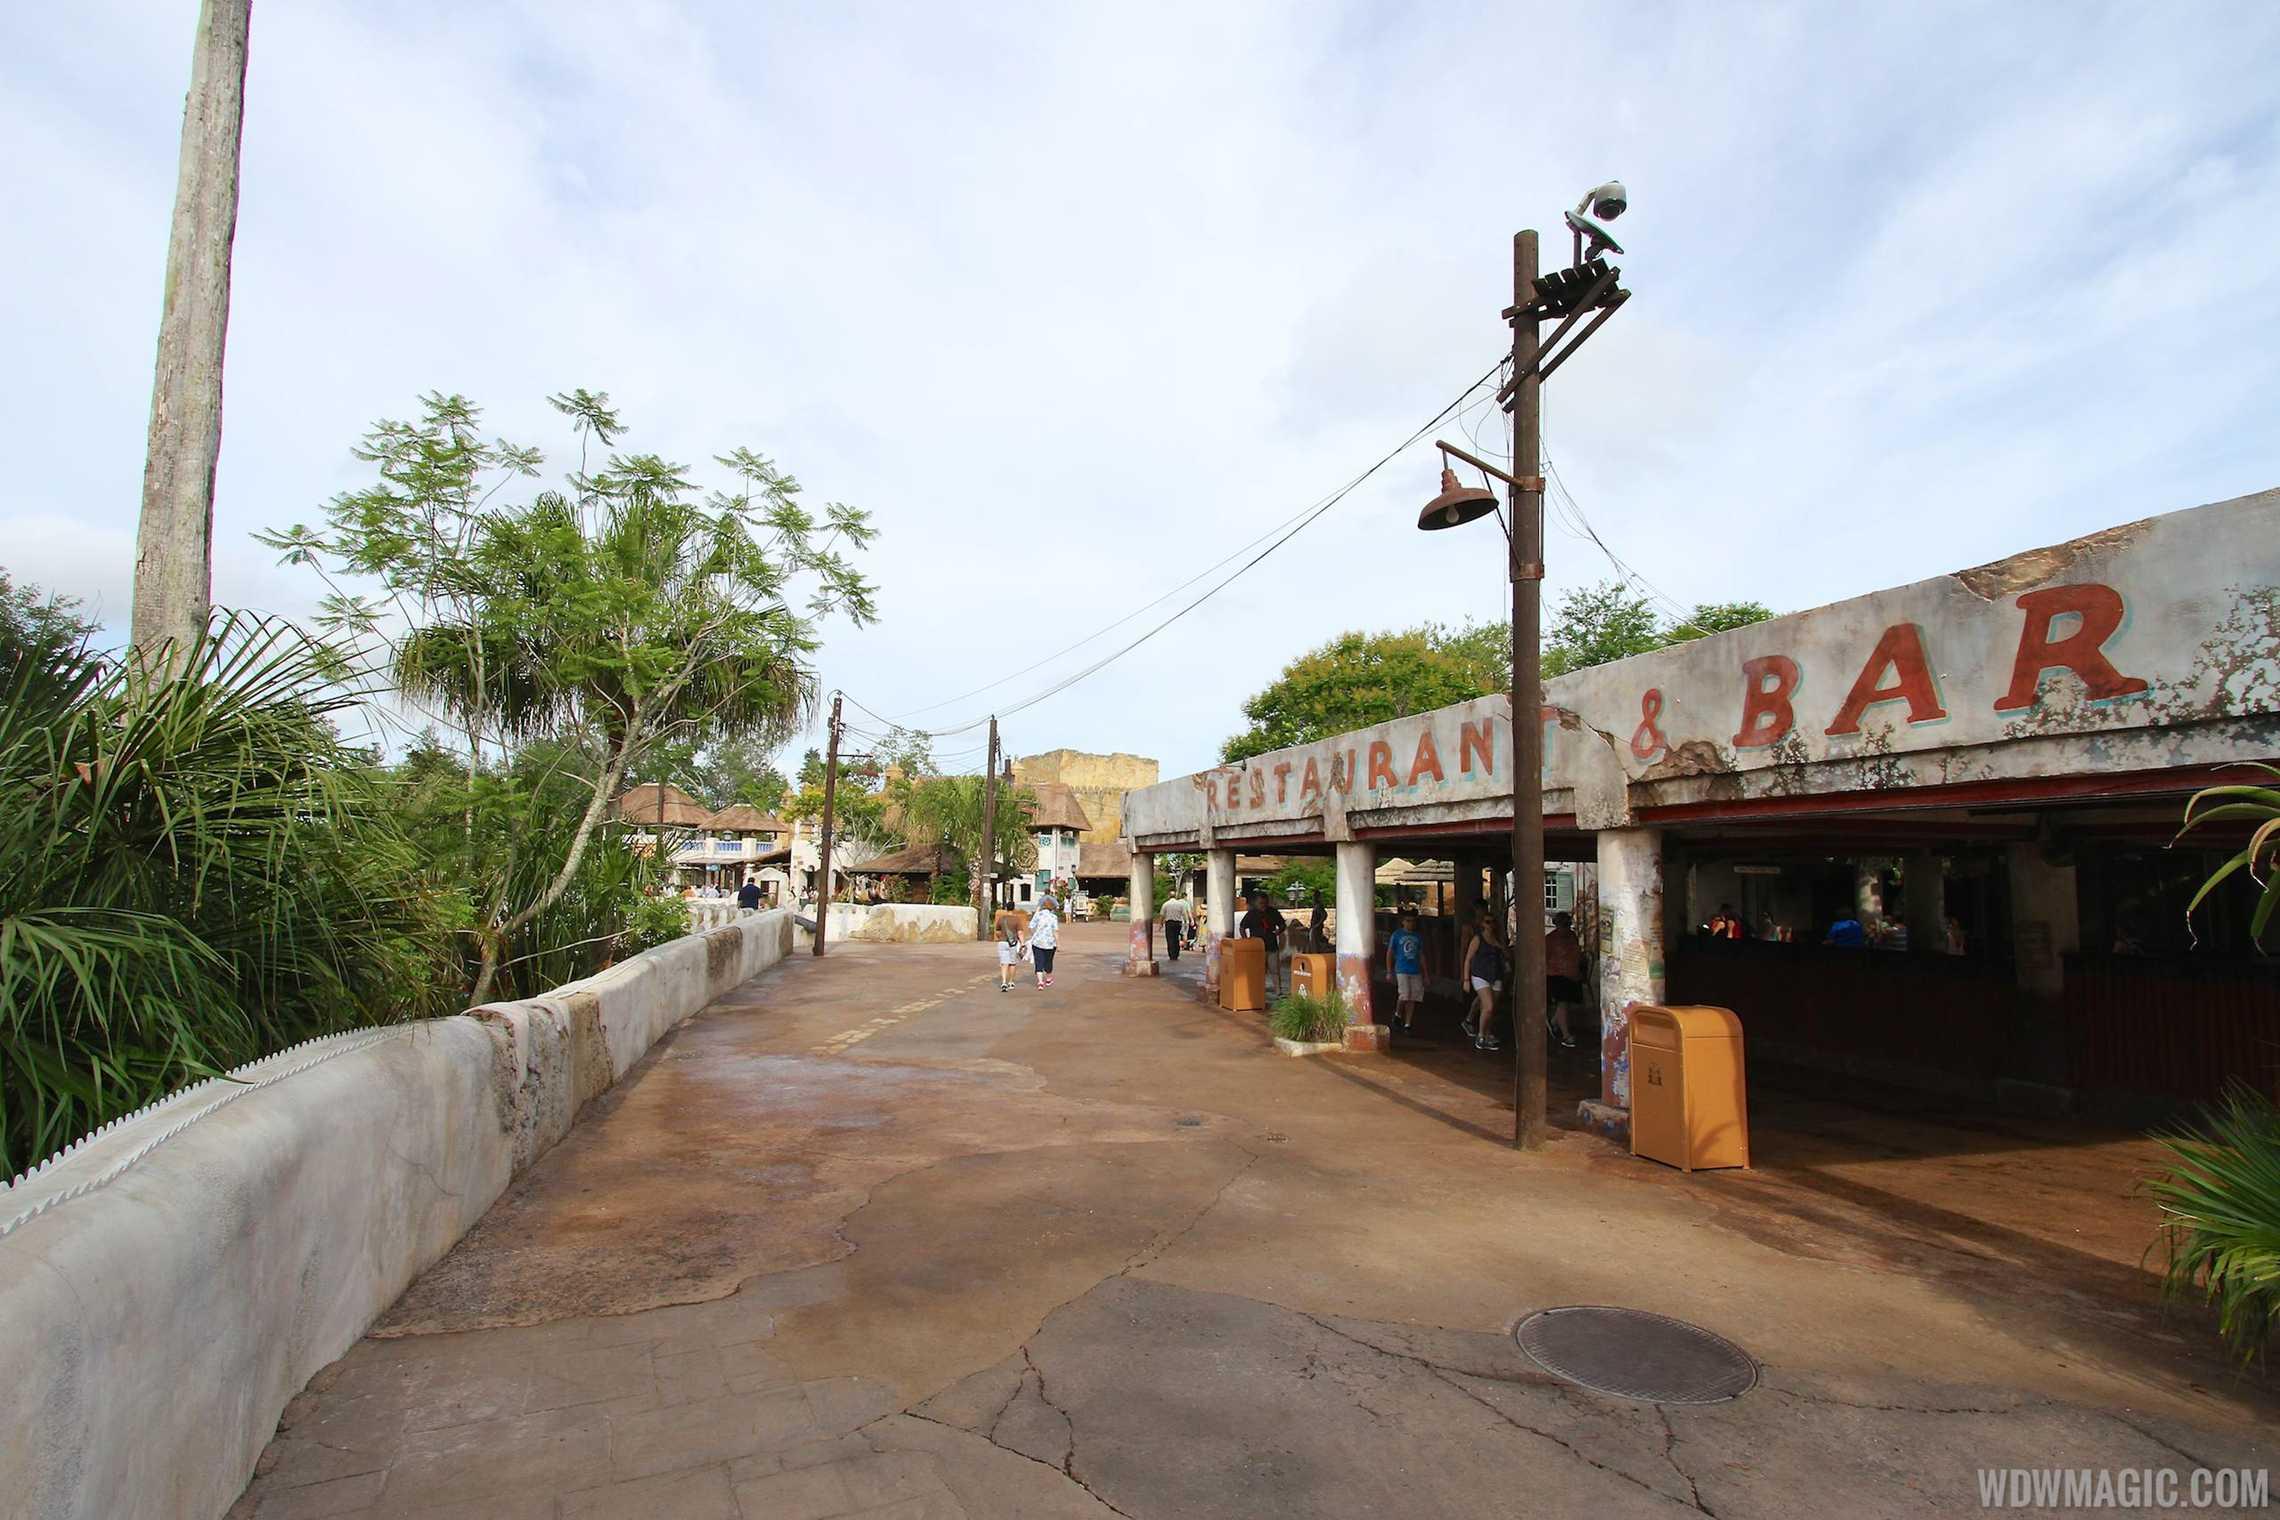 New Harambe Theatre area in Africa - Walkway into new area along Dawa Bar